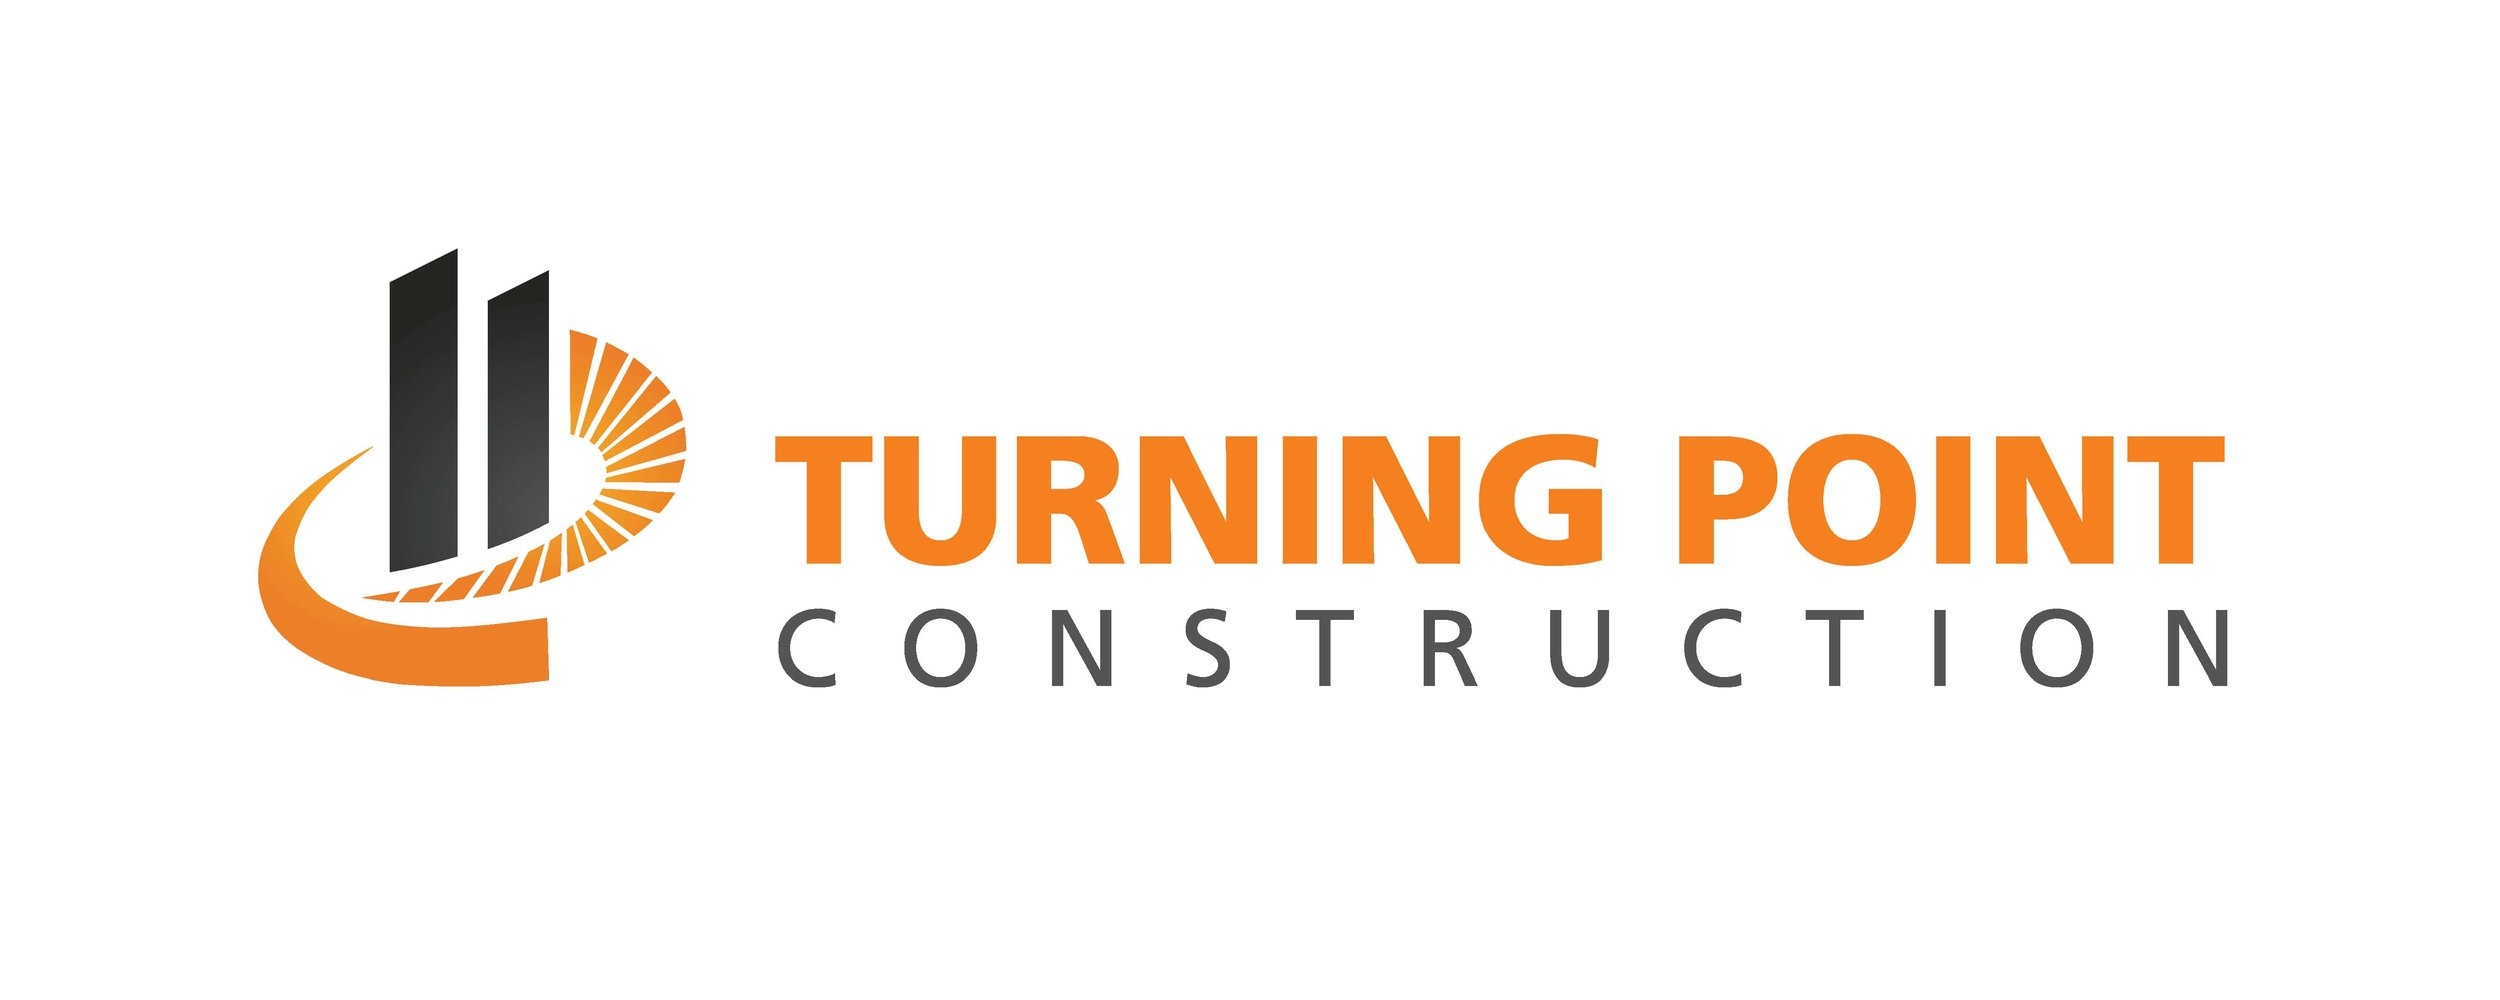 Turning Point Construction.jpg